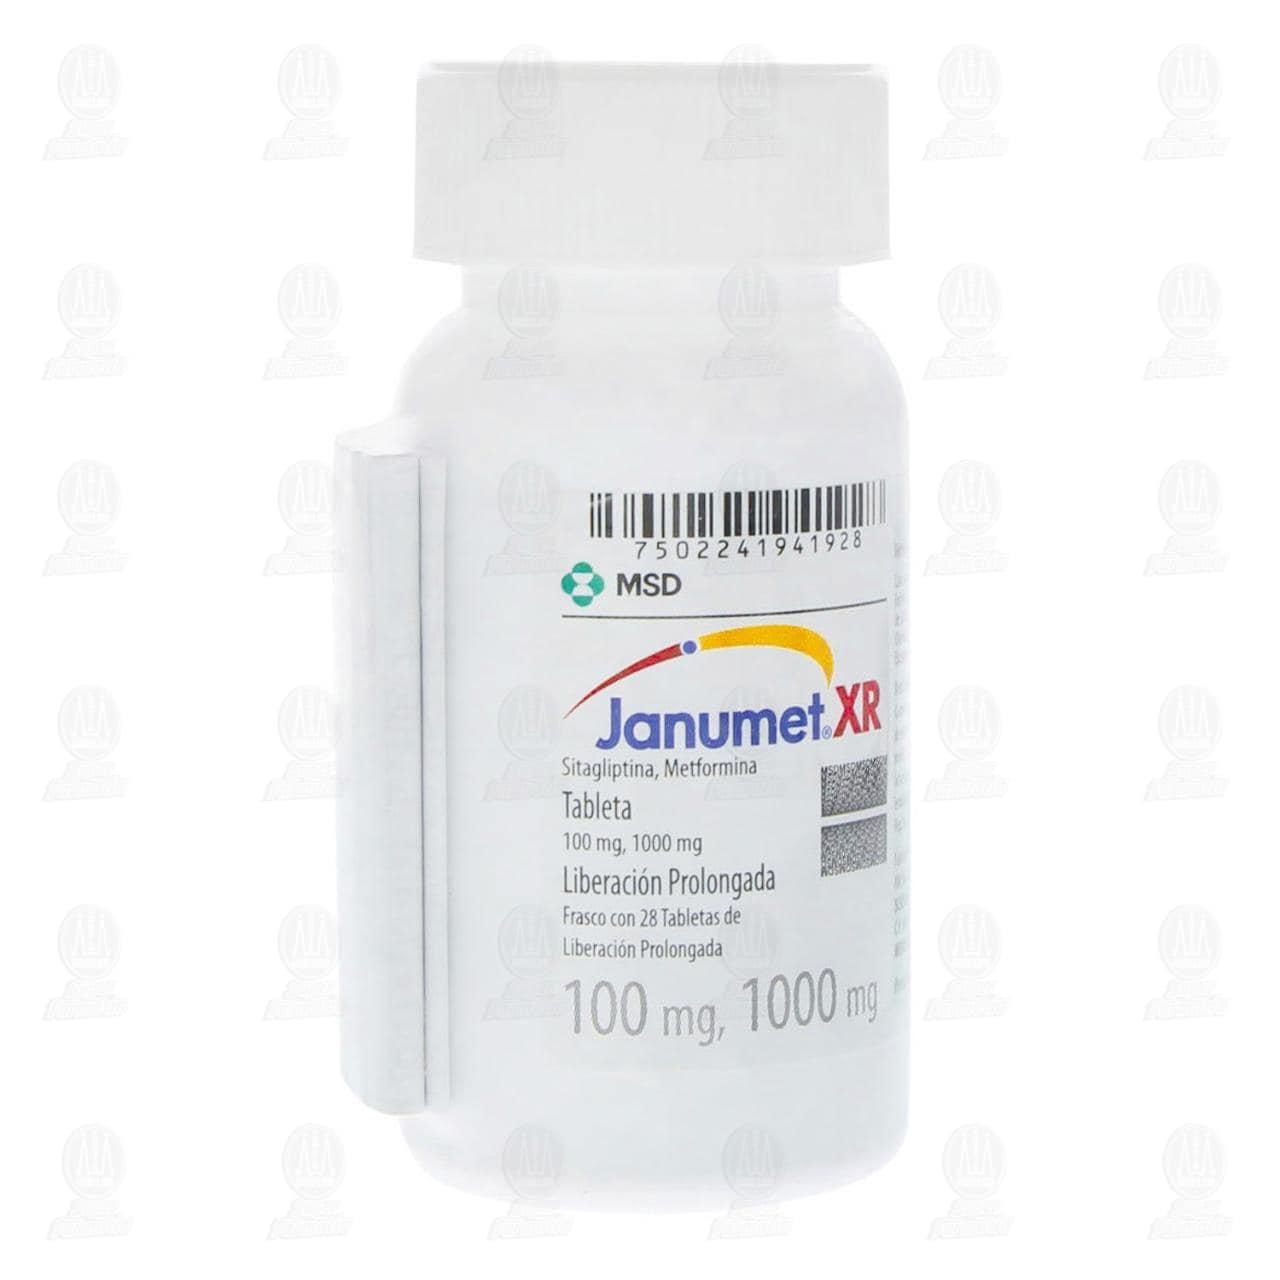 Janumet XR 100/1000mg 28 Tabletas Liberación Prolongada